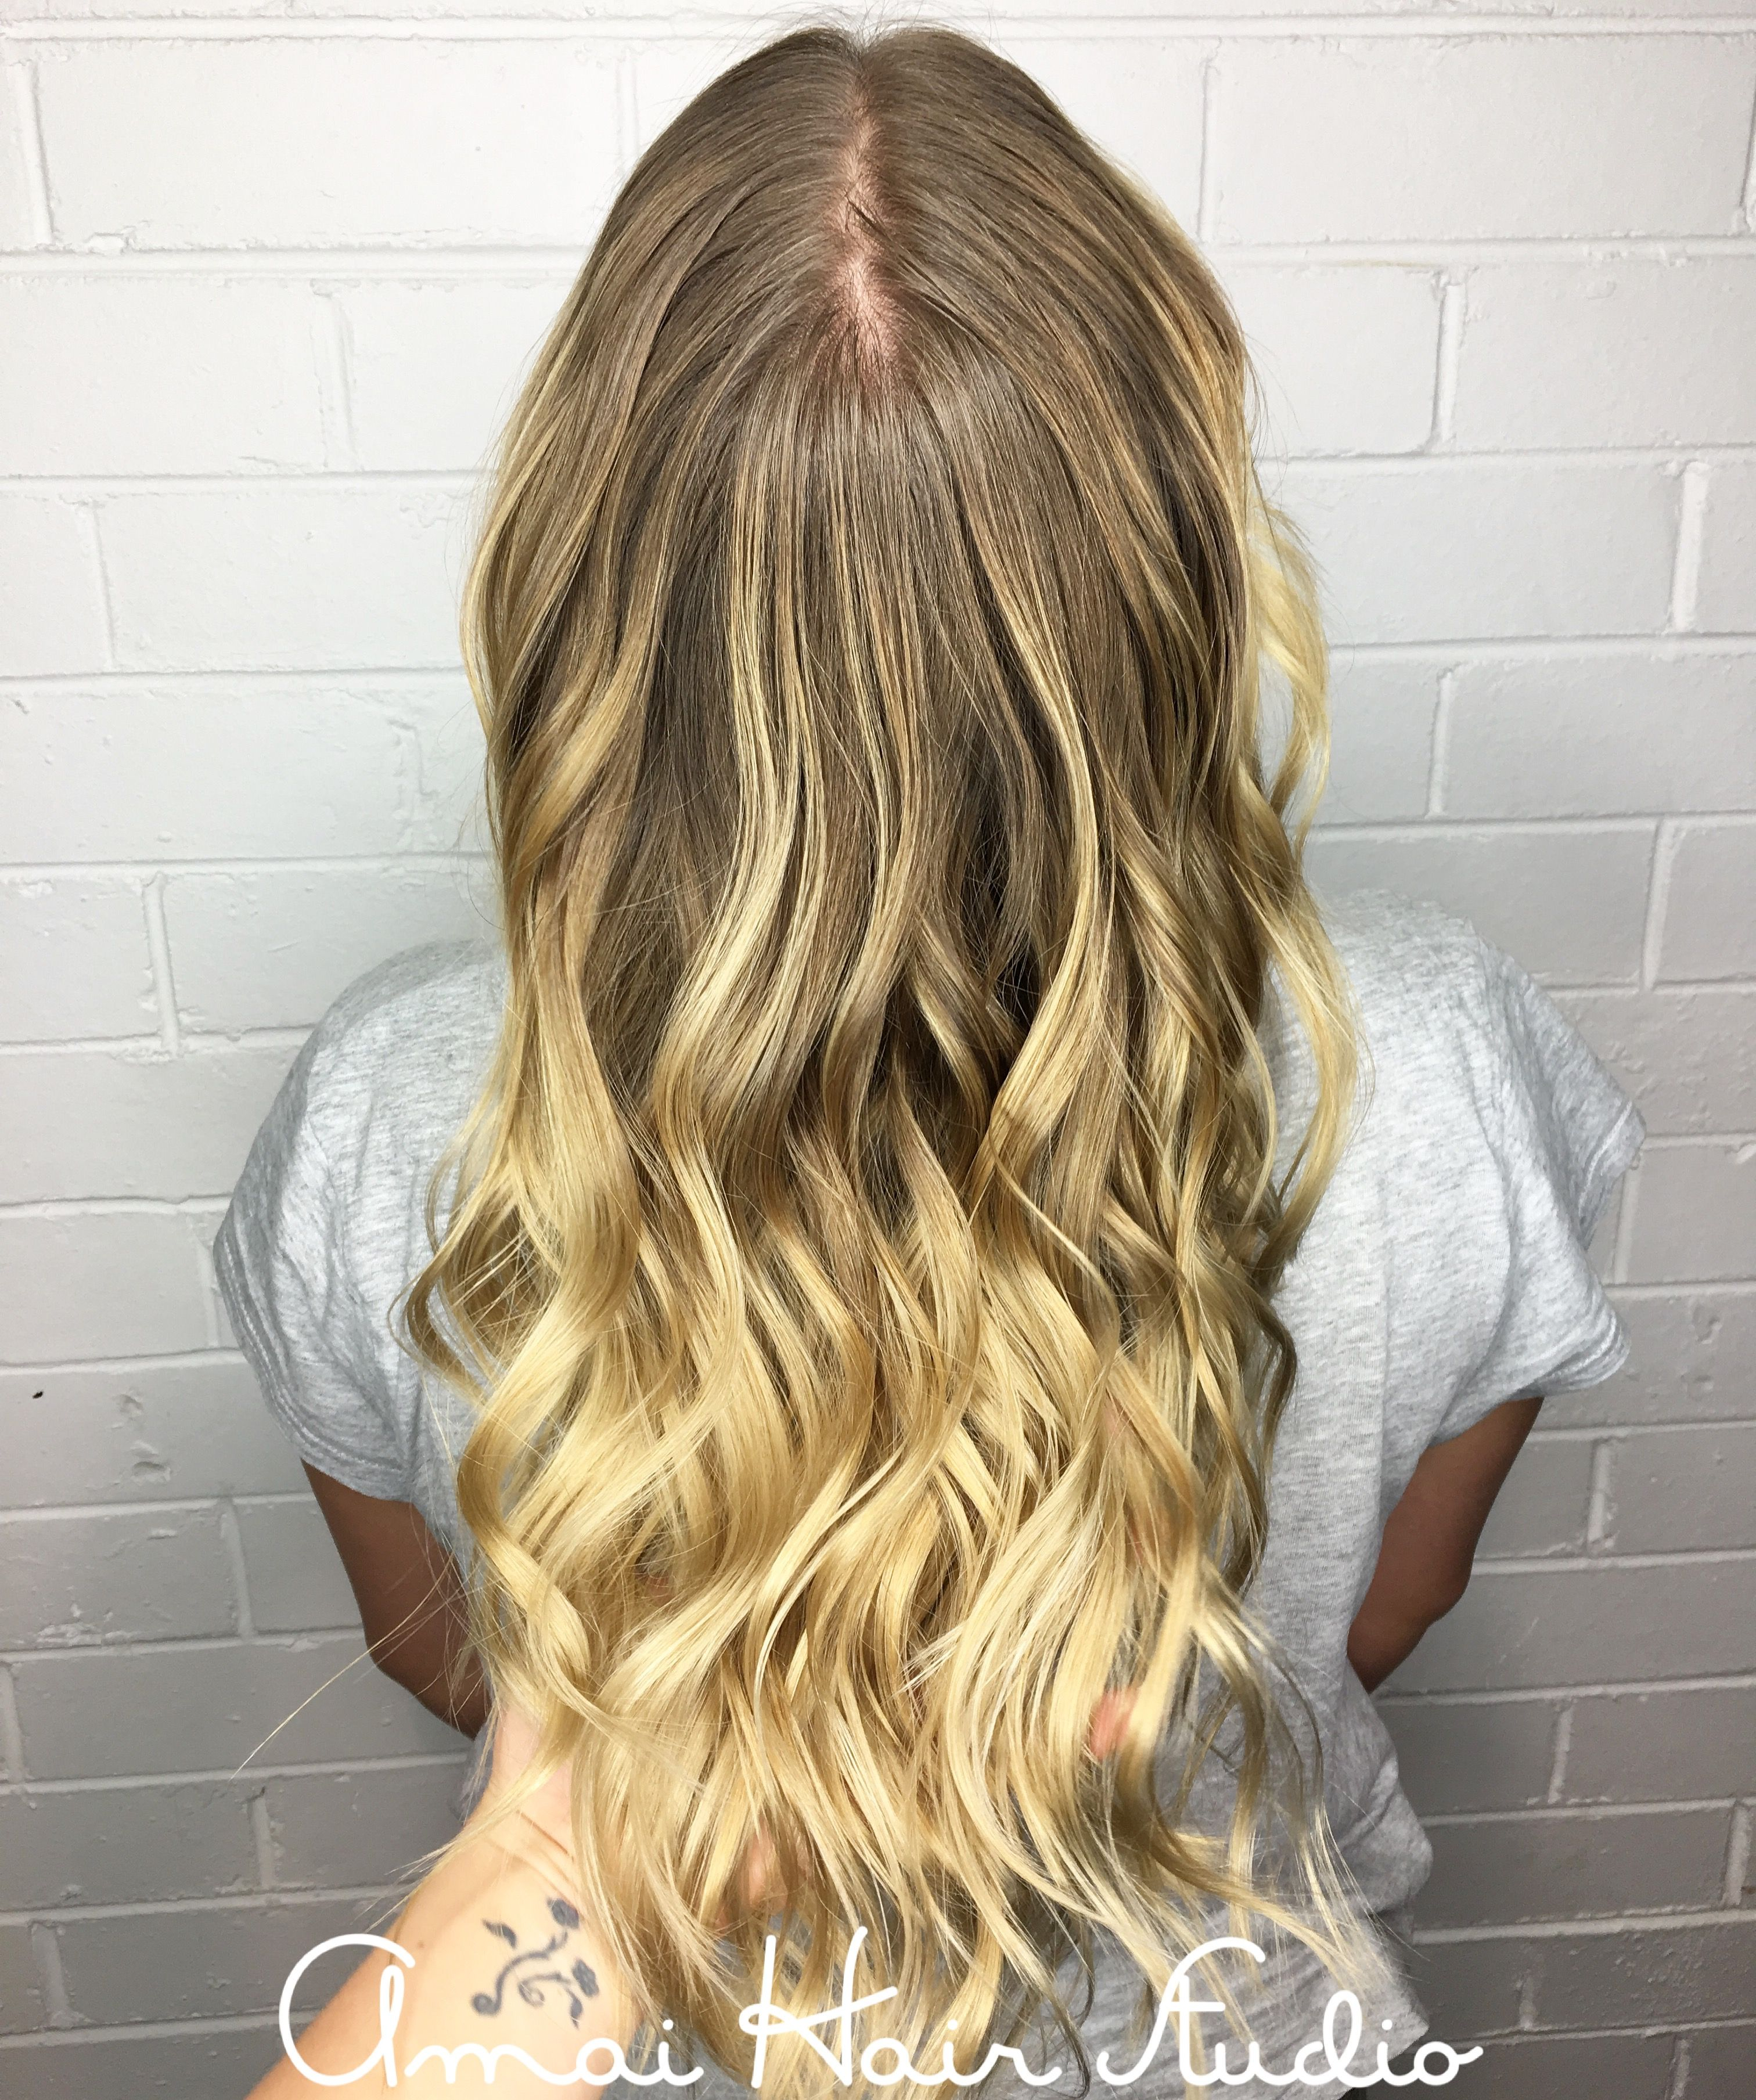 Blonde balayage beach blonde long blonde hair amai hair studio